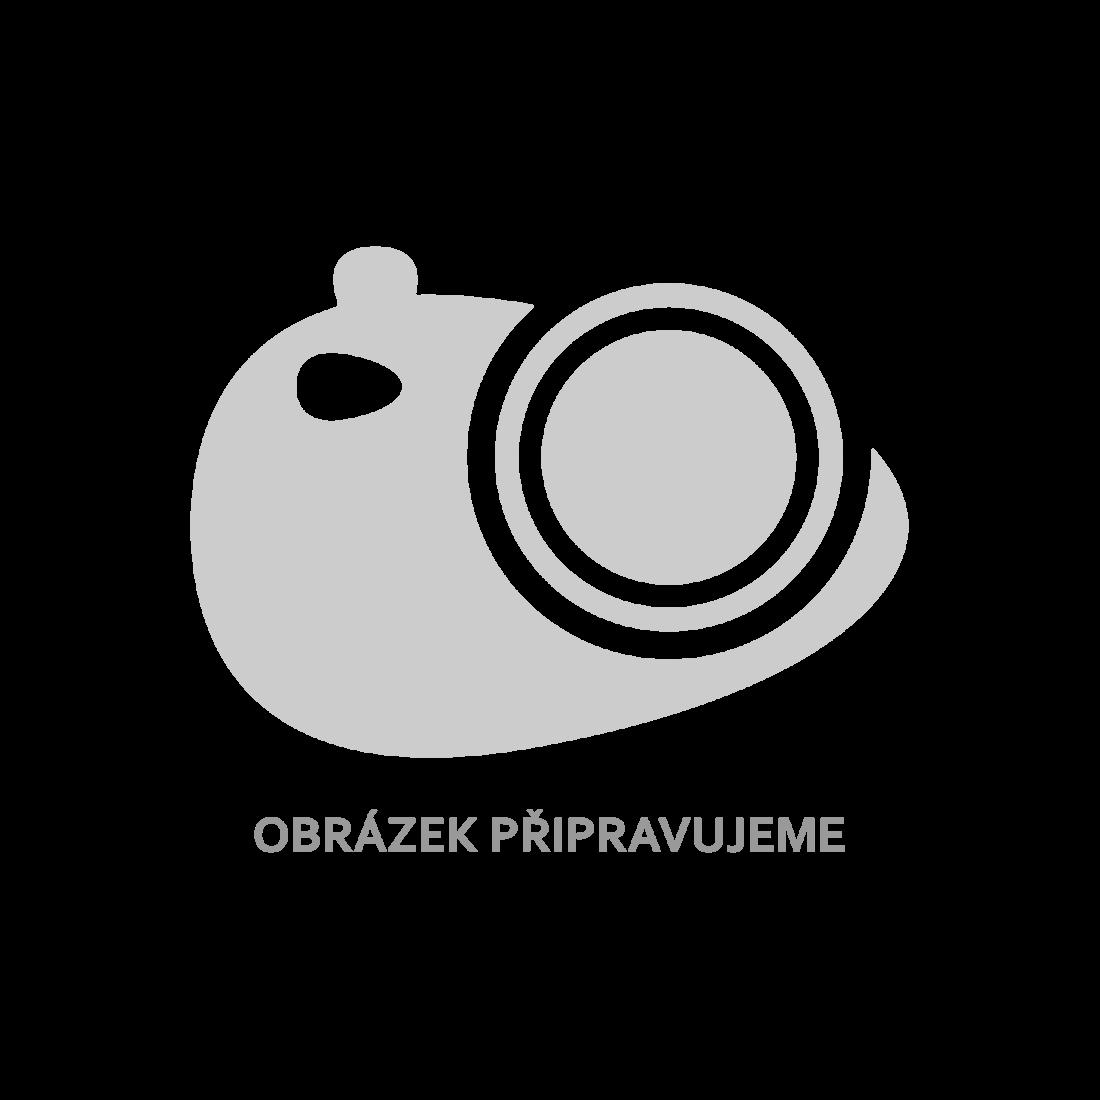 vidaXL Nástěnné police kostky 3 ks bílé MDF [323949]